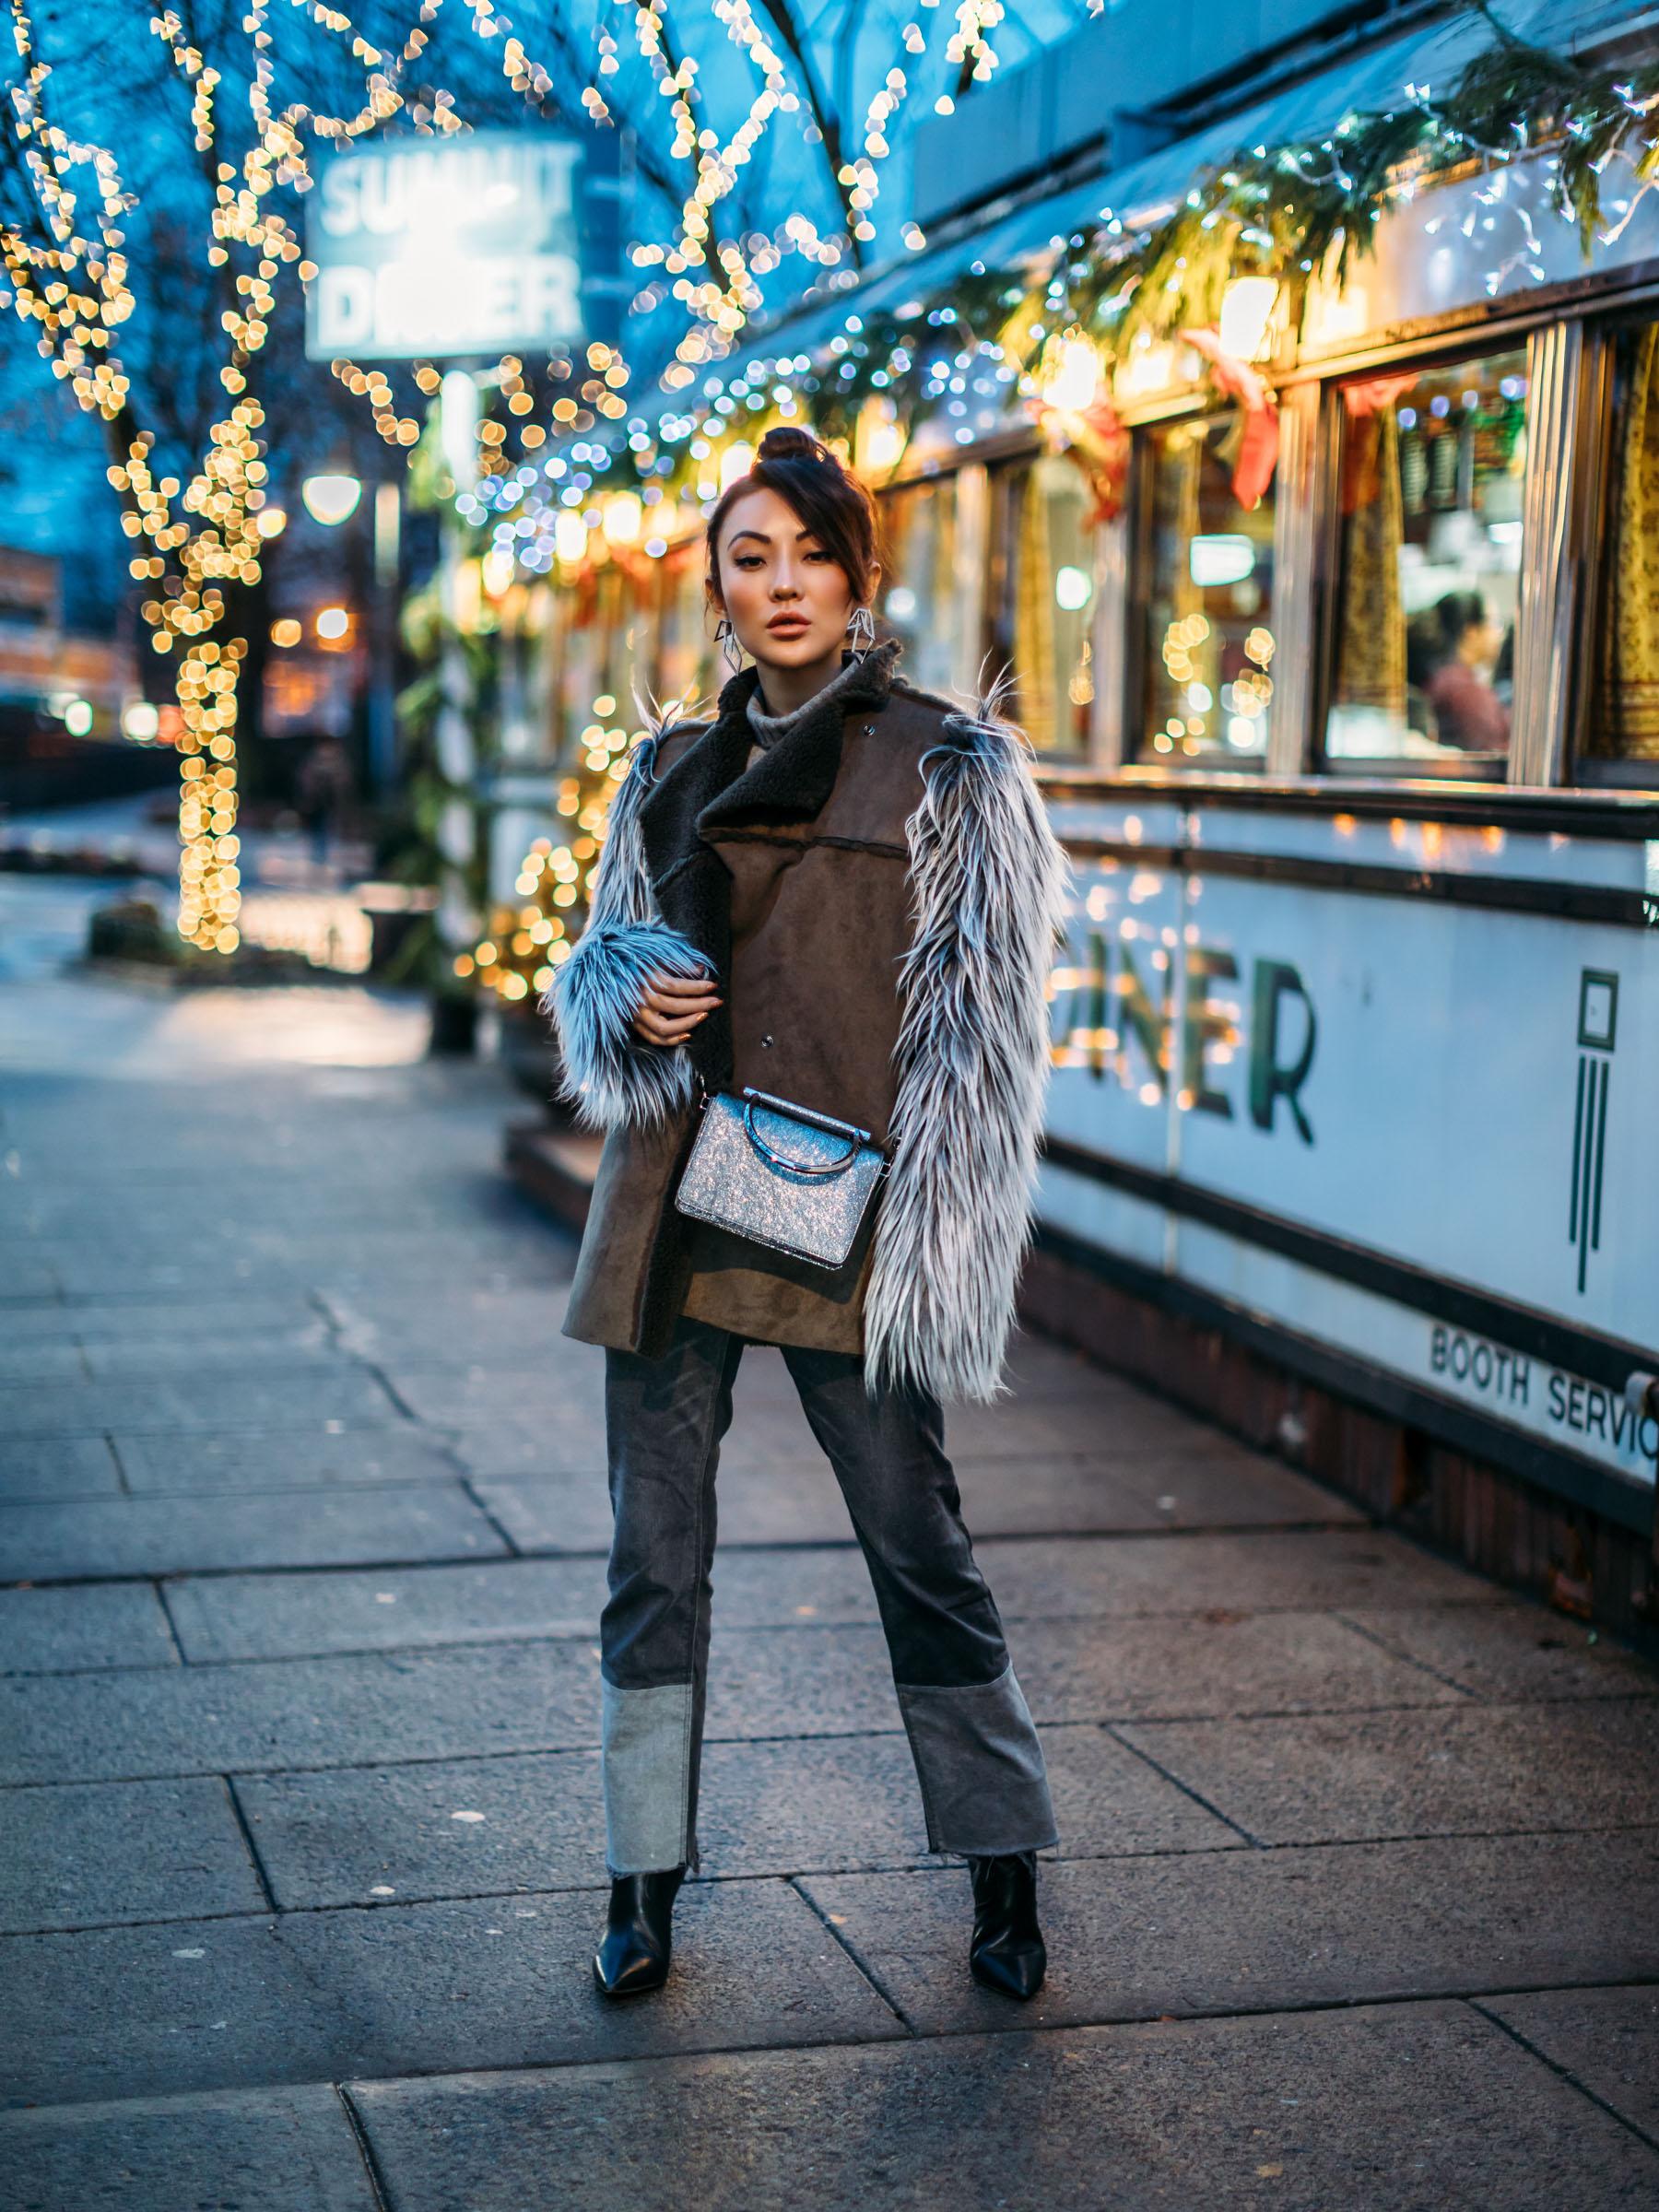 Instagram Outfits Round Up // Notjessfashion.com // Cozy Layered looks, jessica wang, fashion blogger, new york fashion blogger, street style fashion, ootd, asian blogger, fur coat, suede coat, patchwork denim, glitter handbag, glitter clutch, winter look,